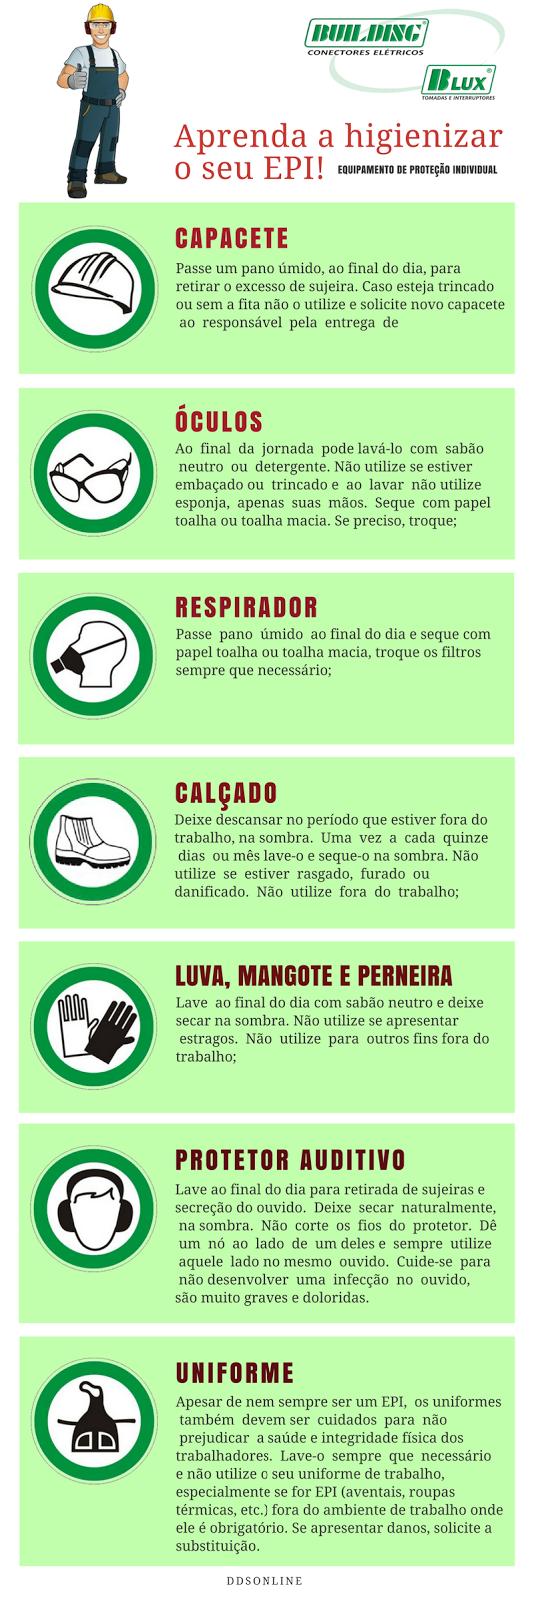 http://building.ind.br/2016/digitalizado/info.pdf